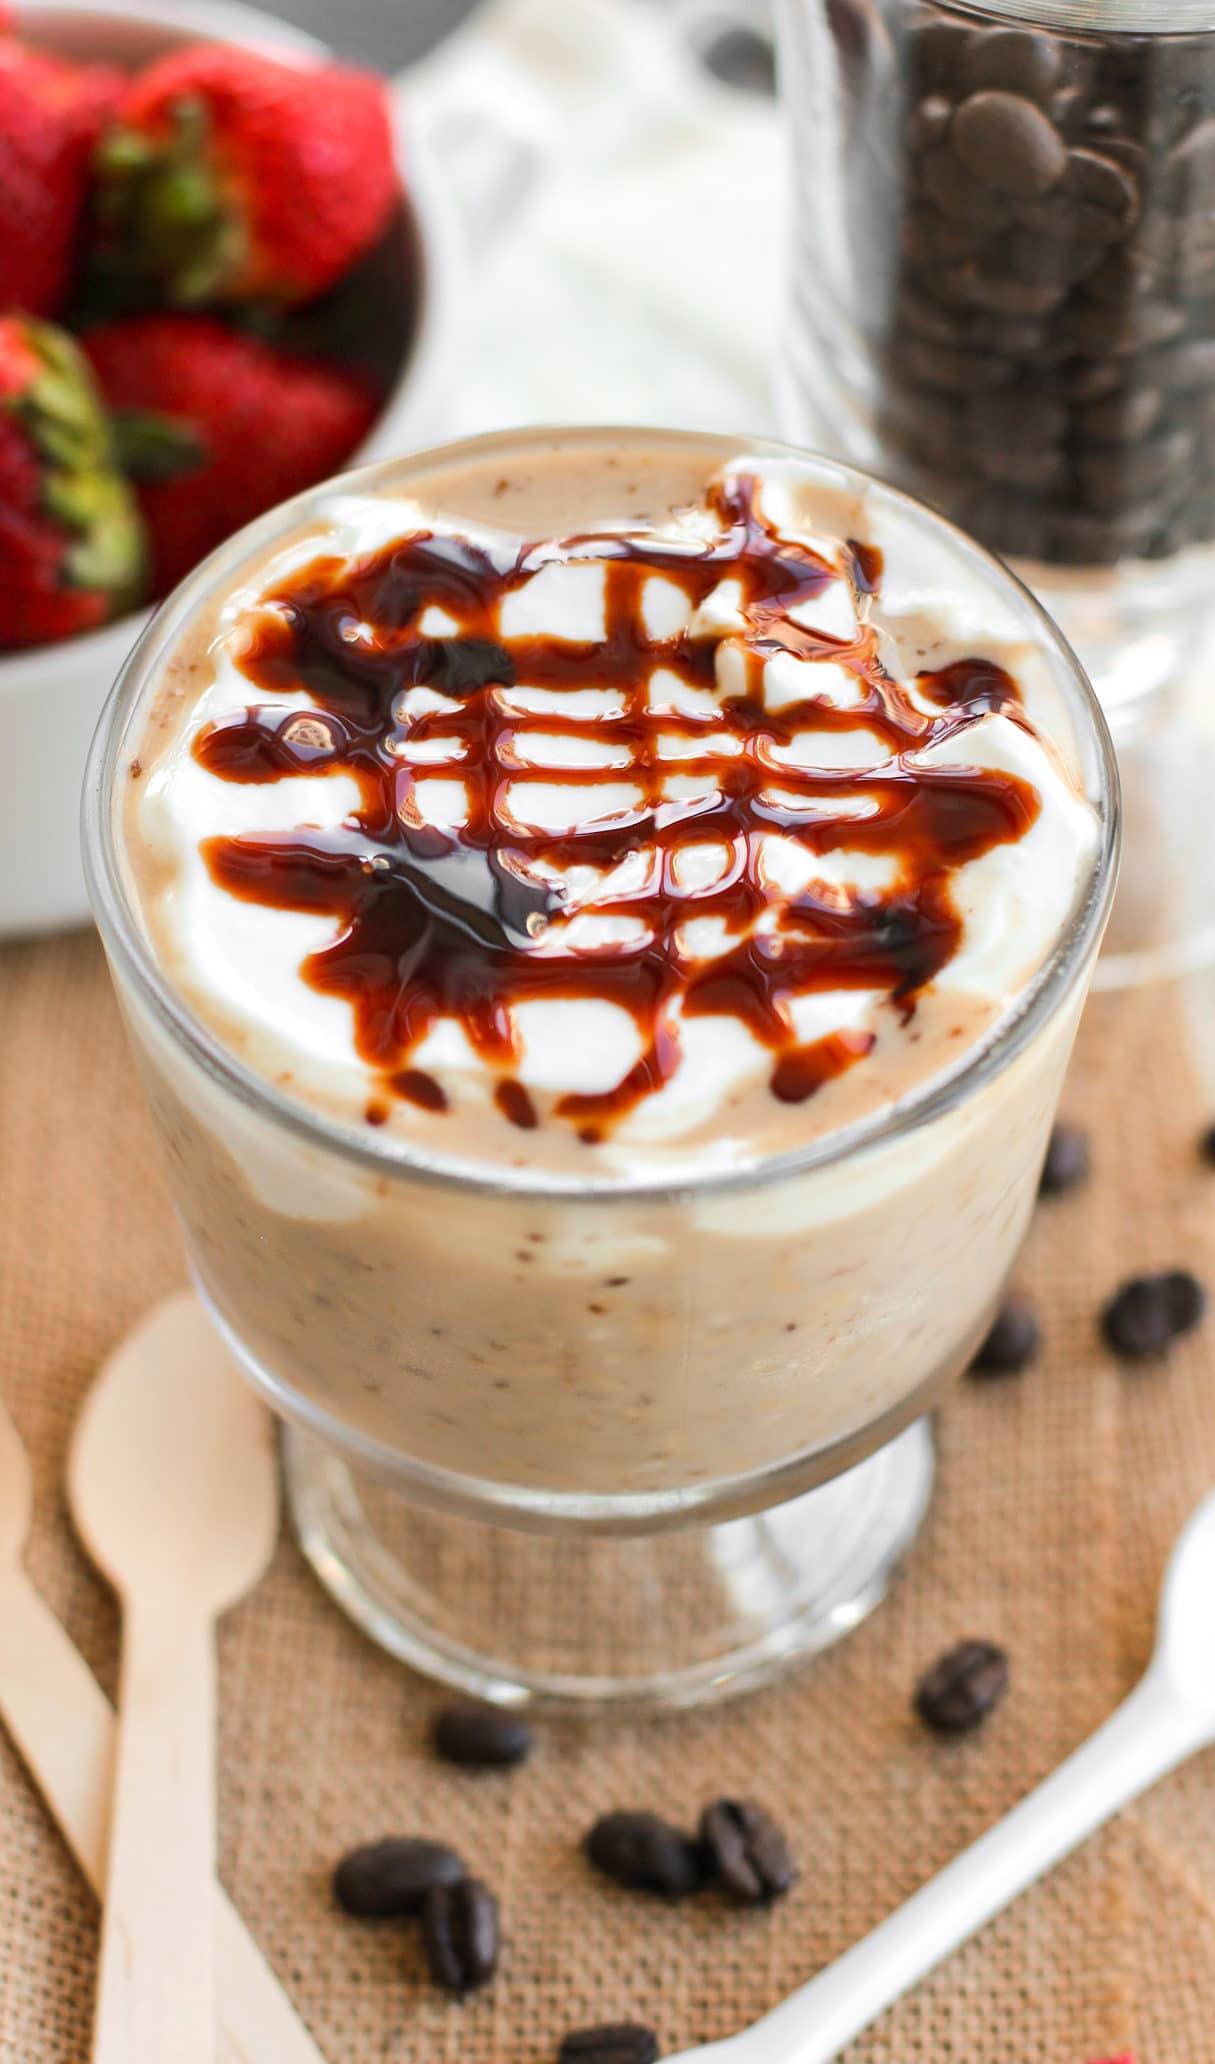 Healthy Caramel Macchiato Overnight Dessert Oats (low sugar, high fiber, gluten free, vegan) - Healthy Dessert Recipes at Desserts with Benefits